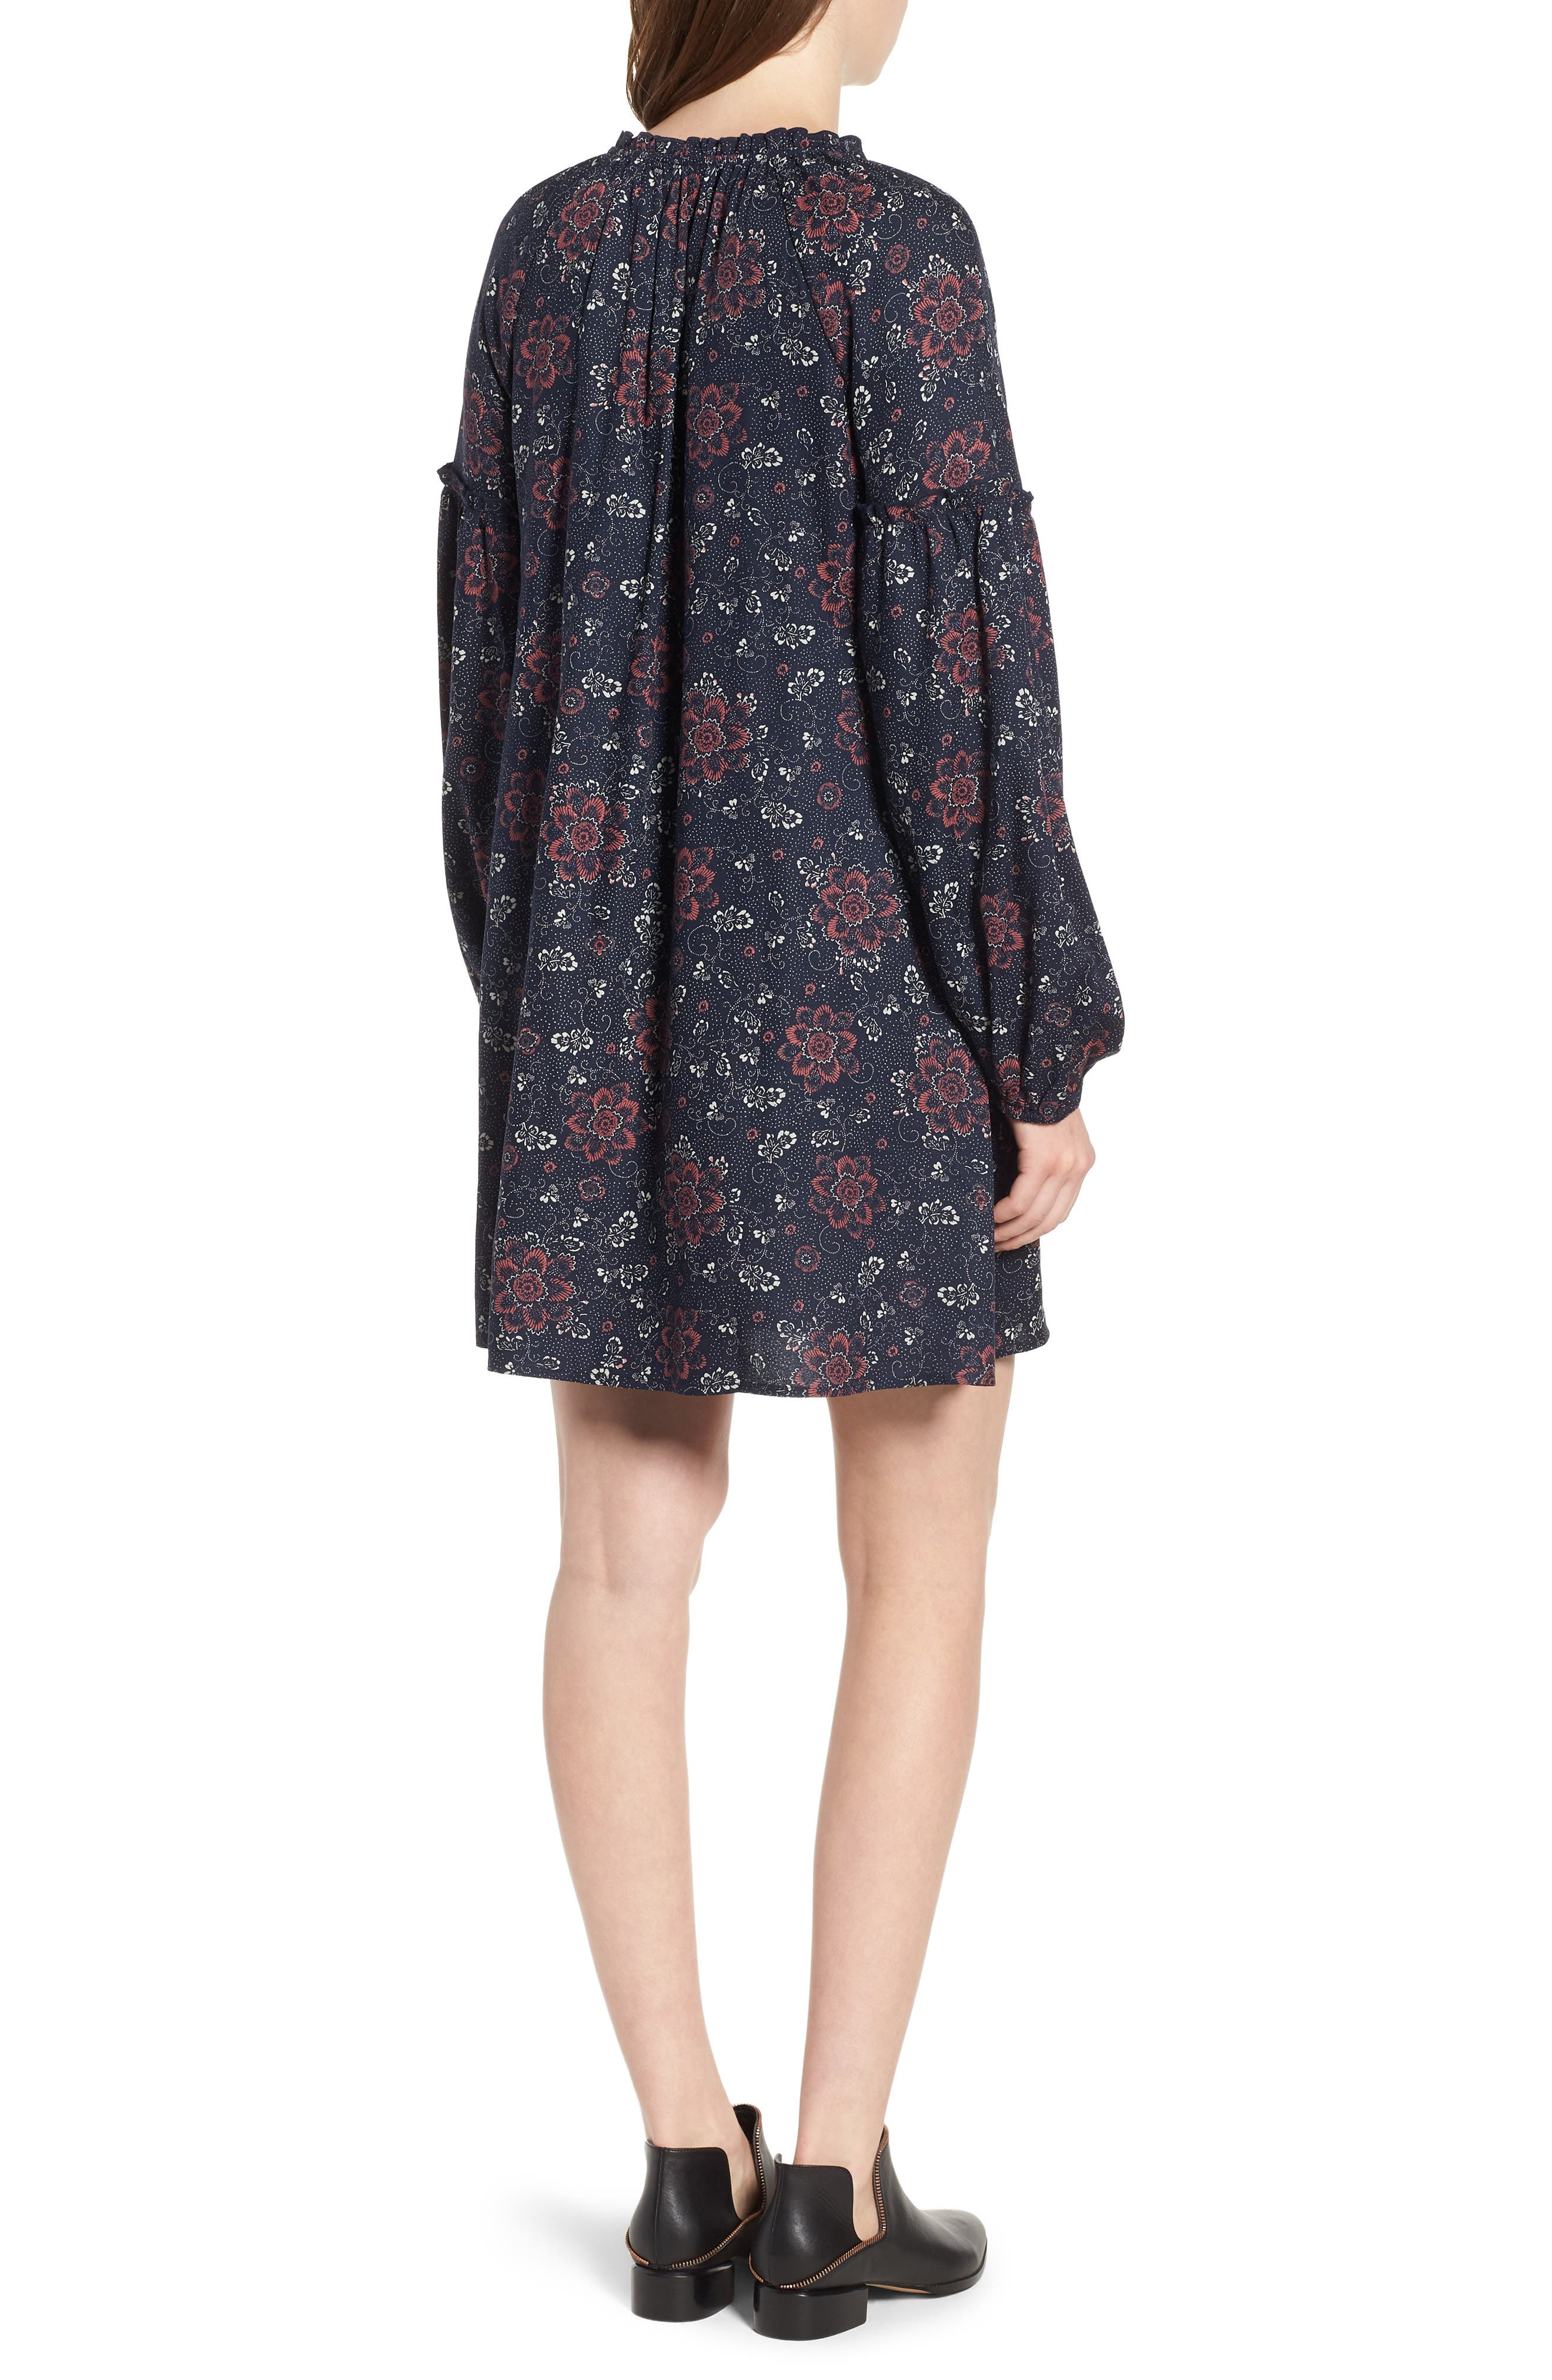 Mix Print Peasant Dress,                             Alternate thumbnail 2, color,                             NAVY NIGHT WOVEN FLORAL MIX